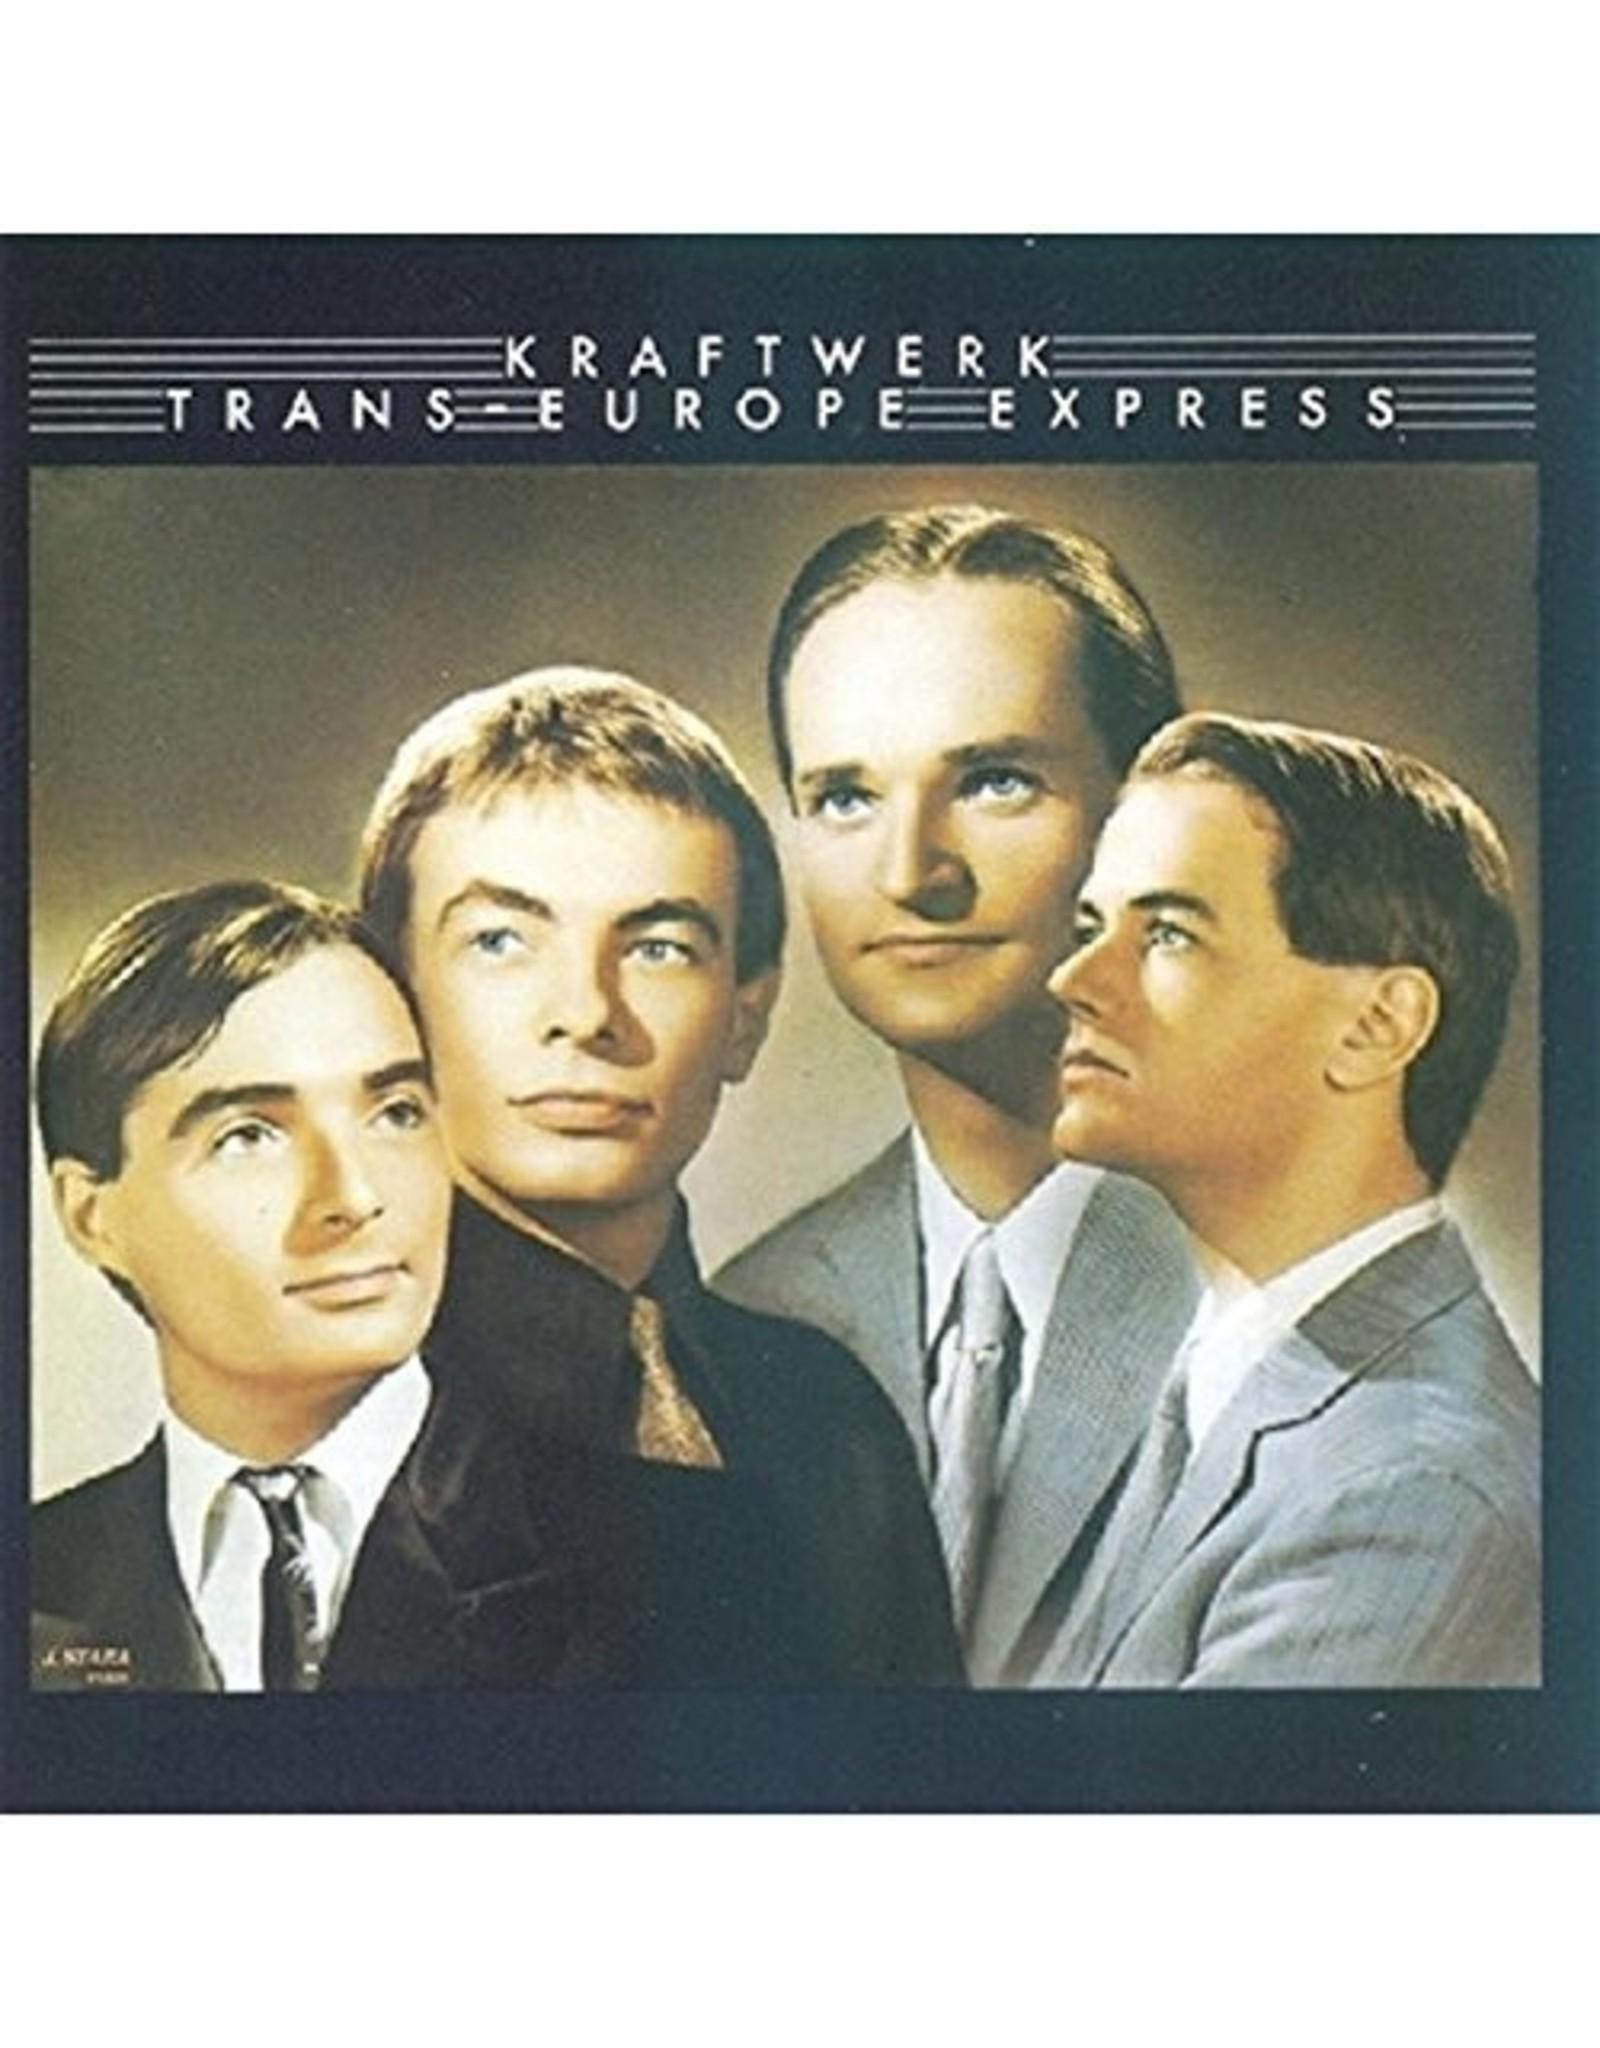 New Vinyl Kraftwerk - Trans-Europe Express LP